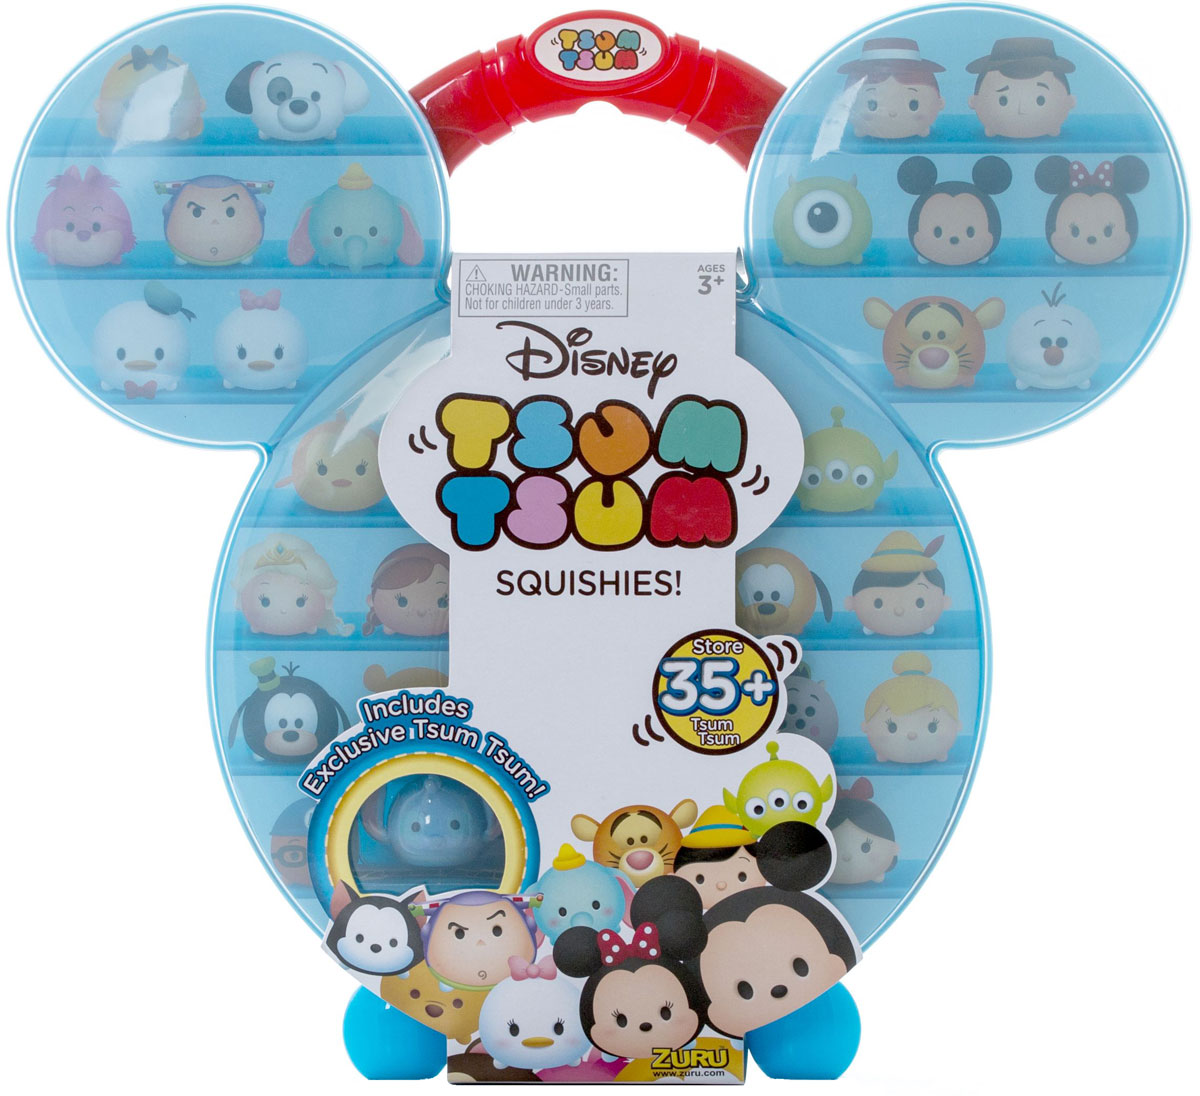 Tsum Tsum Кейс для коллекционирования фигурок new in box tsum tsum stack n play toy shop original